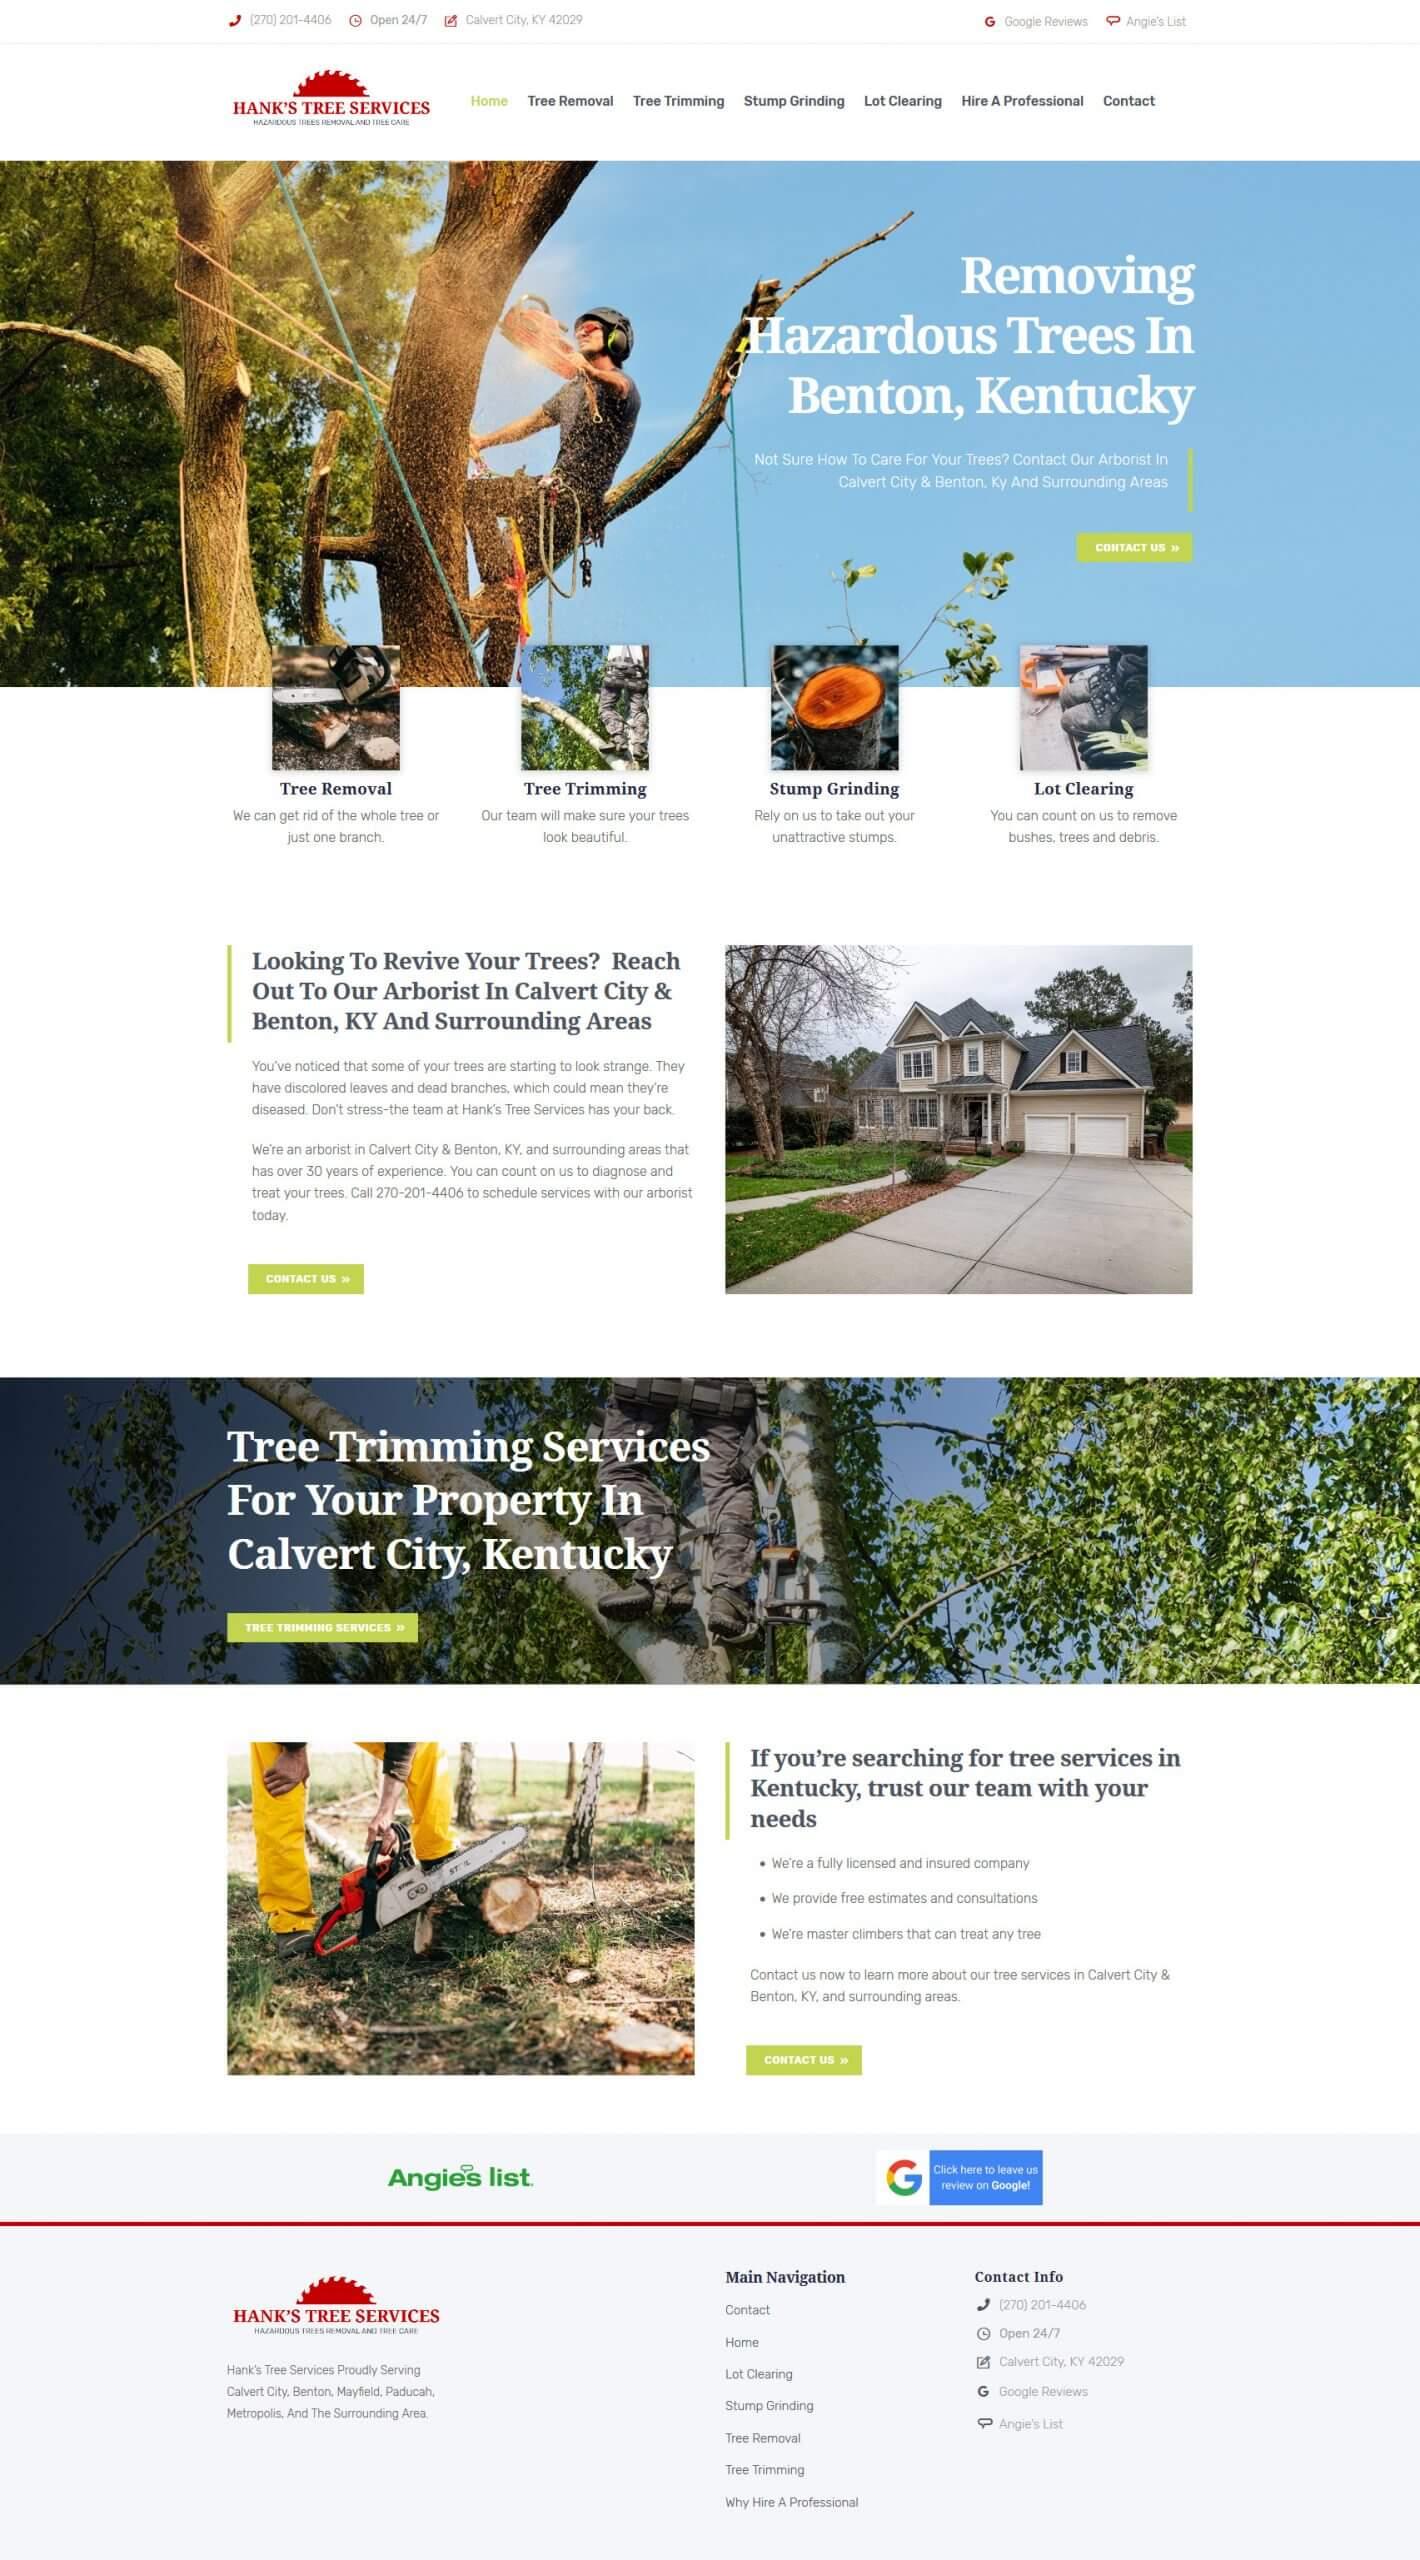 Screenshot 2020 06 23 Arborist Tree Services Tree Removal Calvert City Benton KY – Hanks Tree Services offers tree serv... scaled